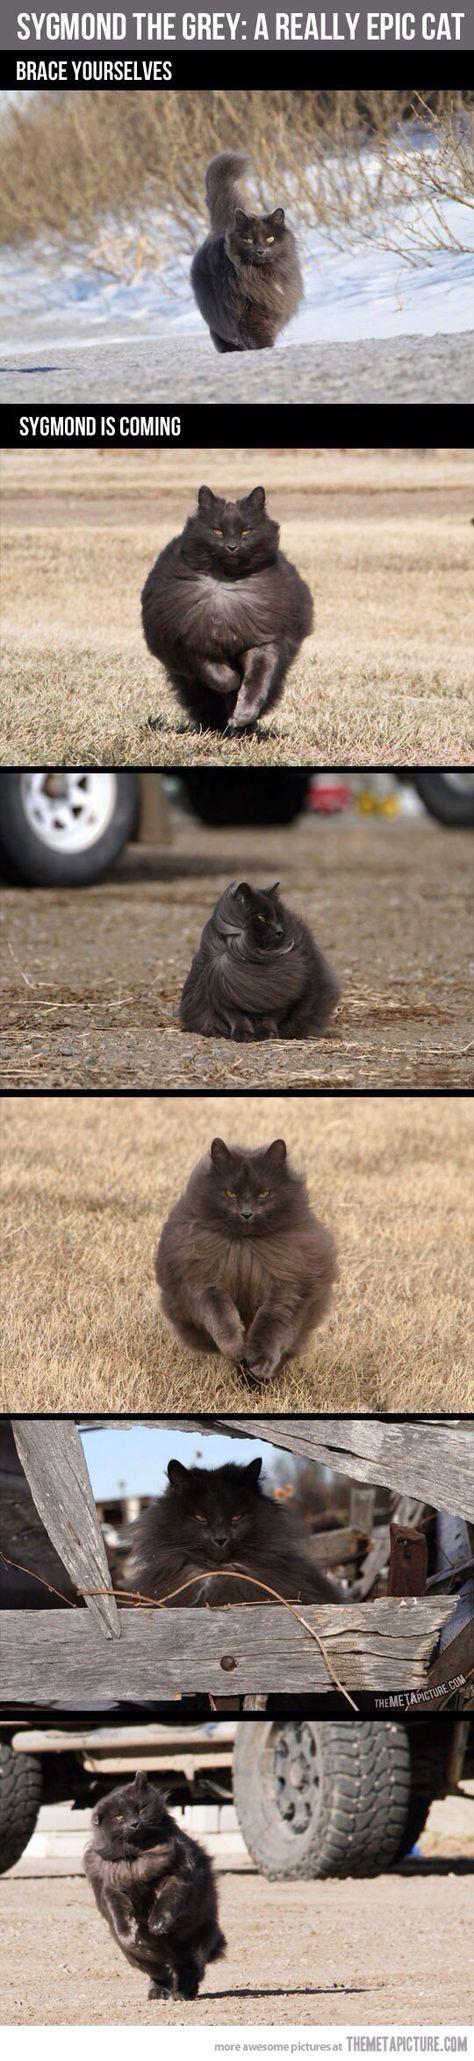 ce4fc f67cd2d8ed23c2849fdf33 fluffy cat kitty cats